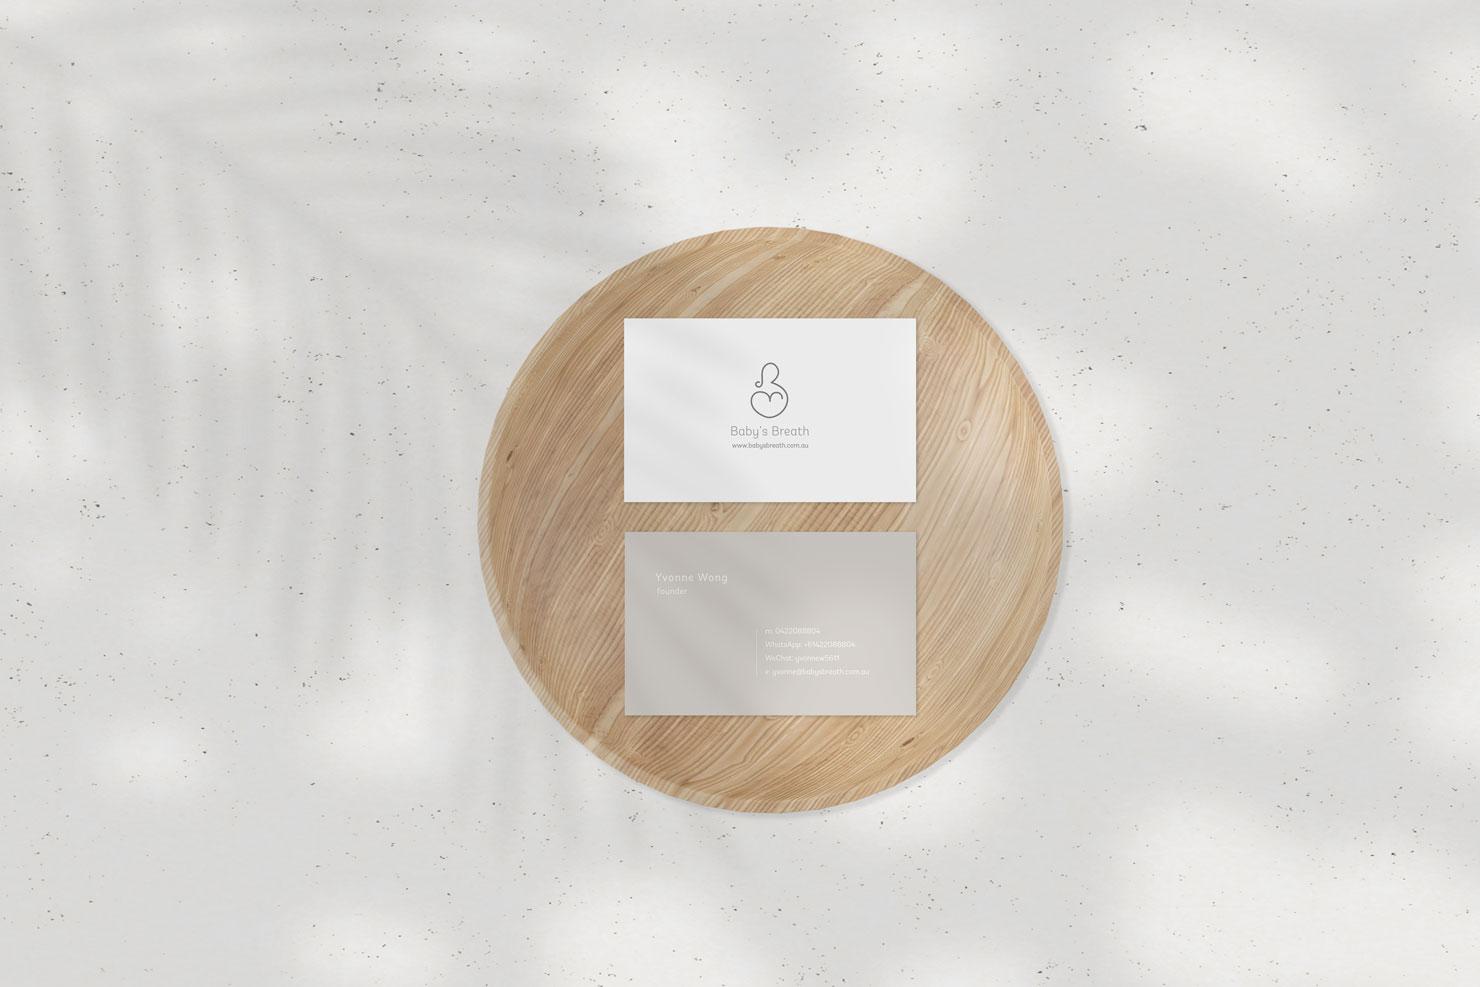 babys breath business card design